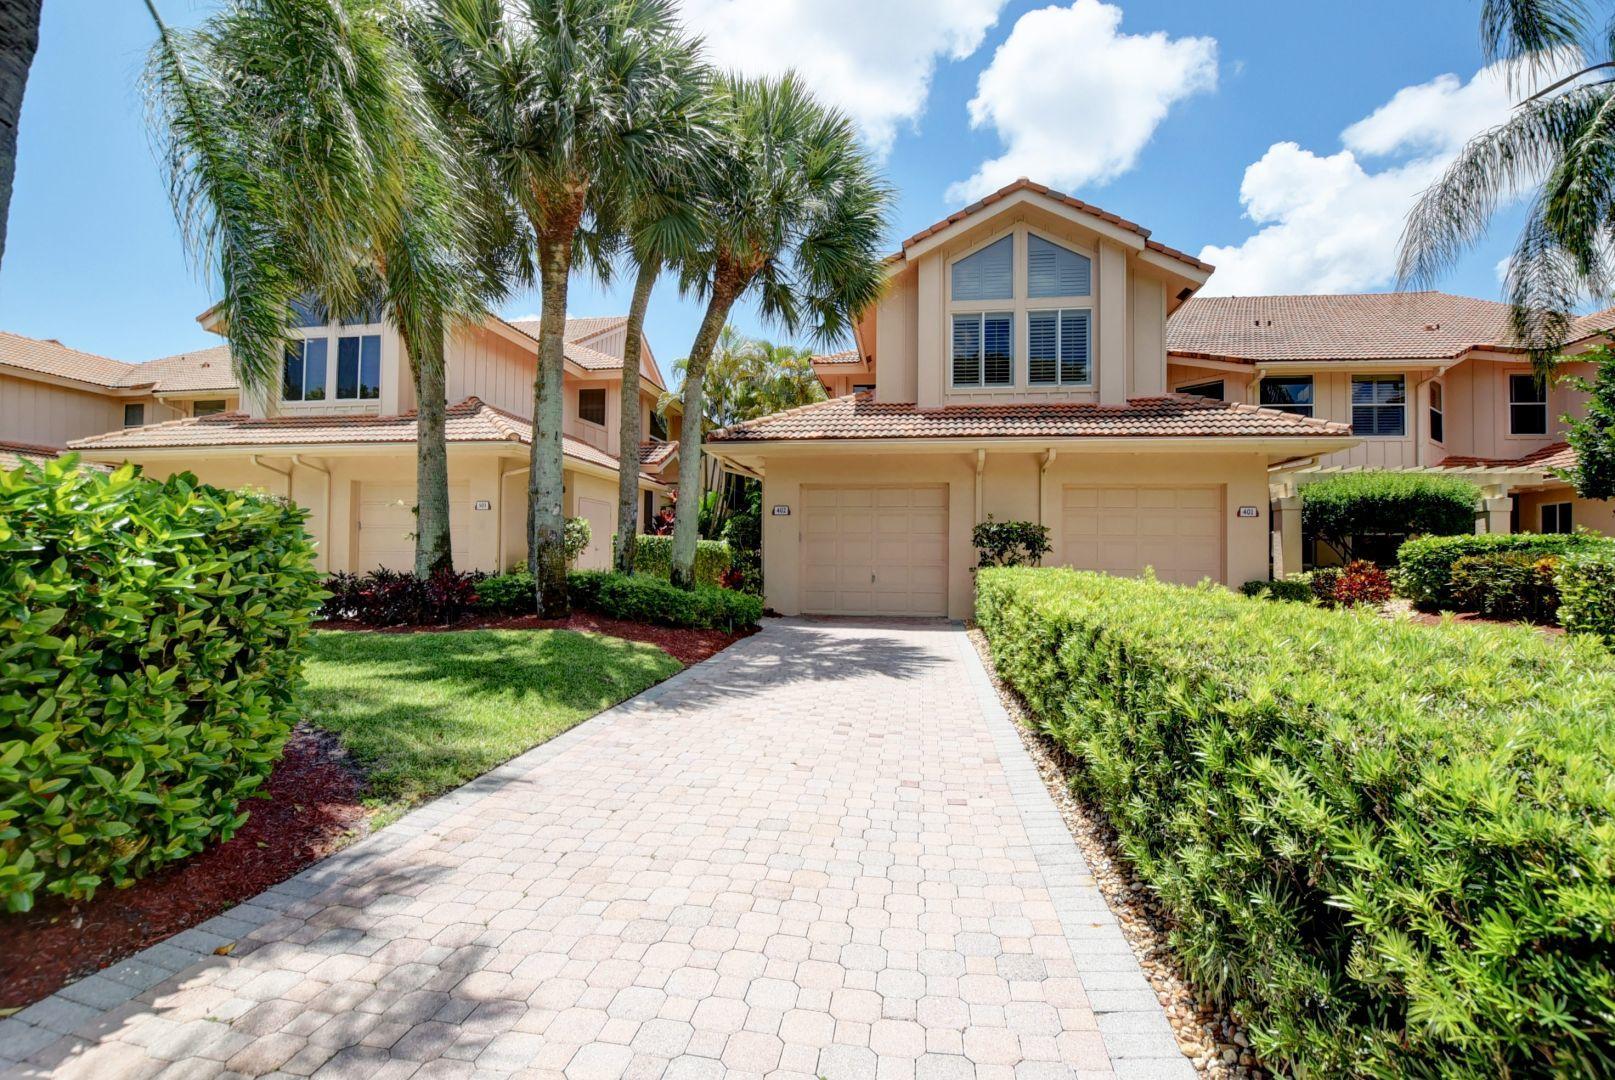 2566 Coco Plum Boulevard #402 Boca Raton, FL 33496